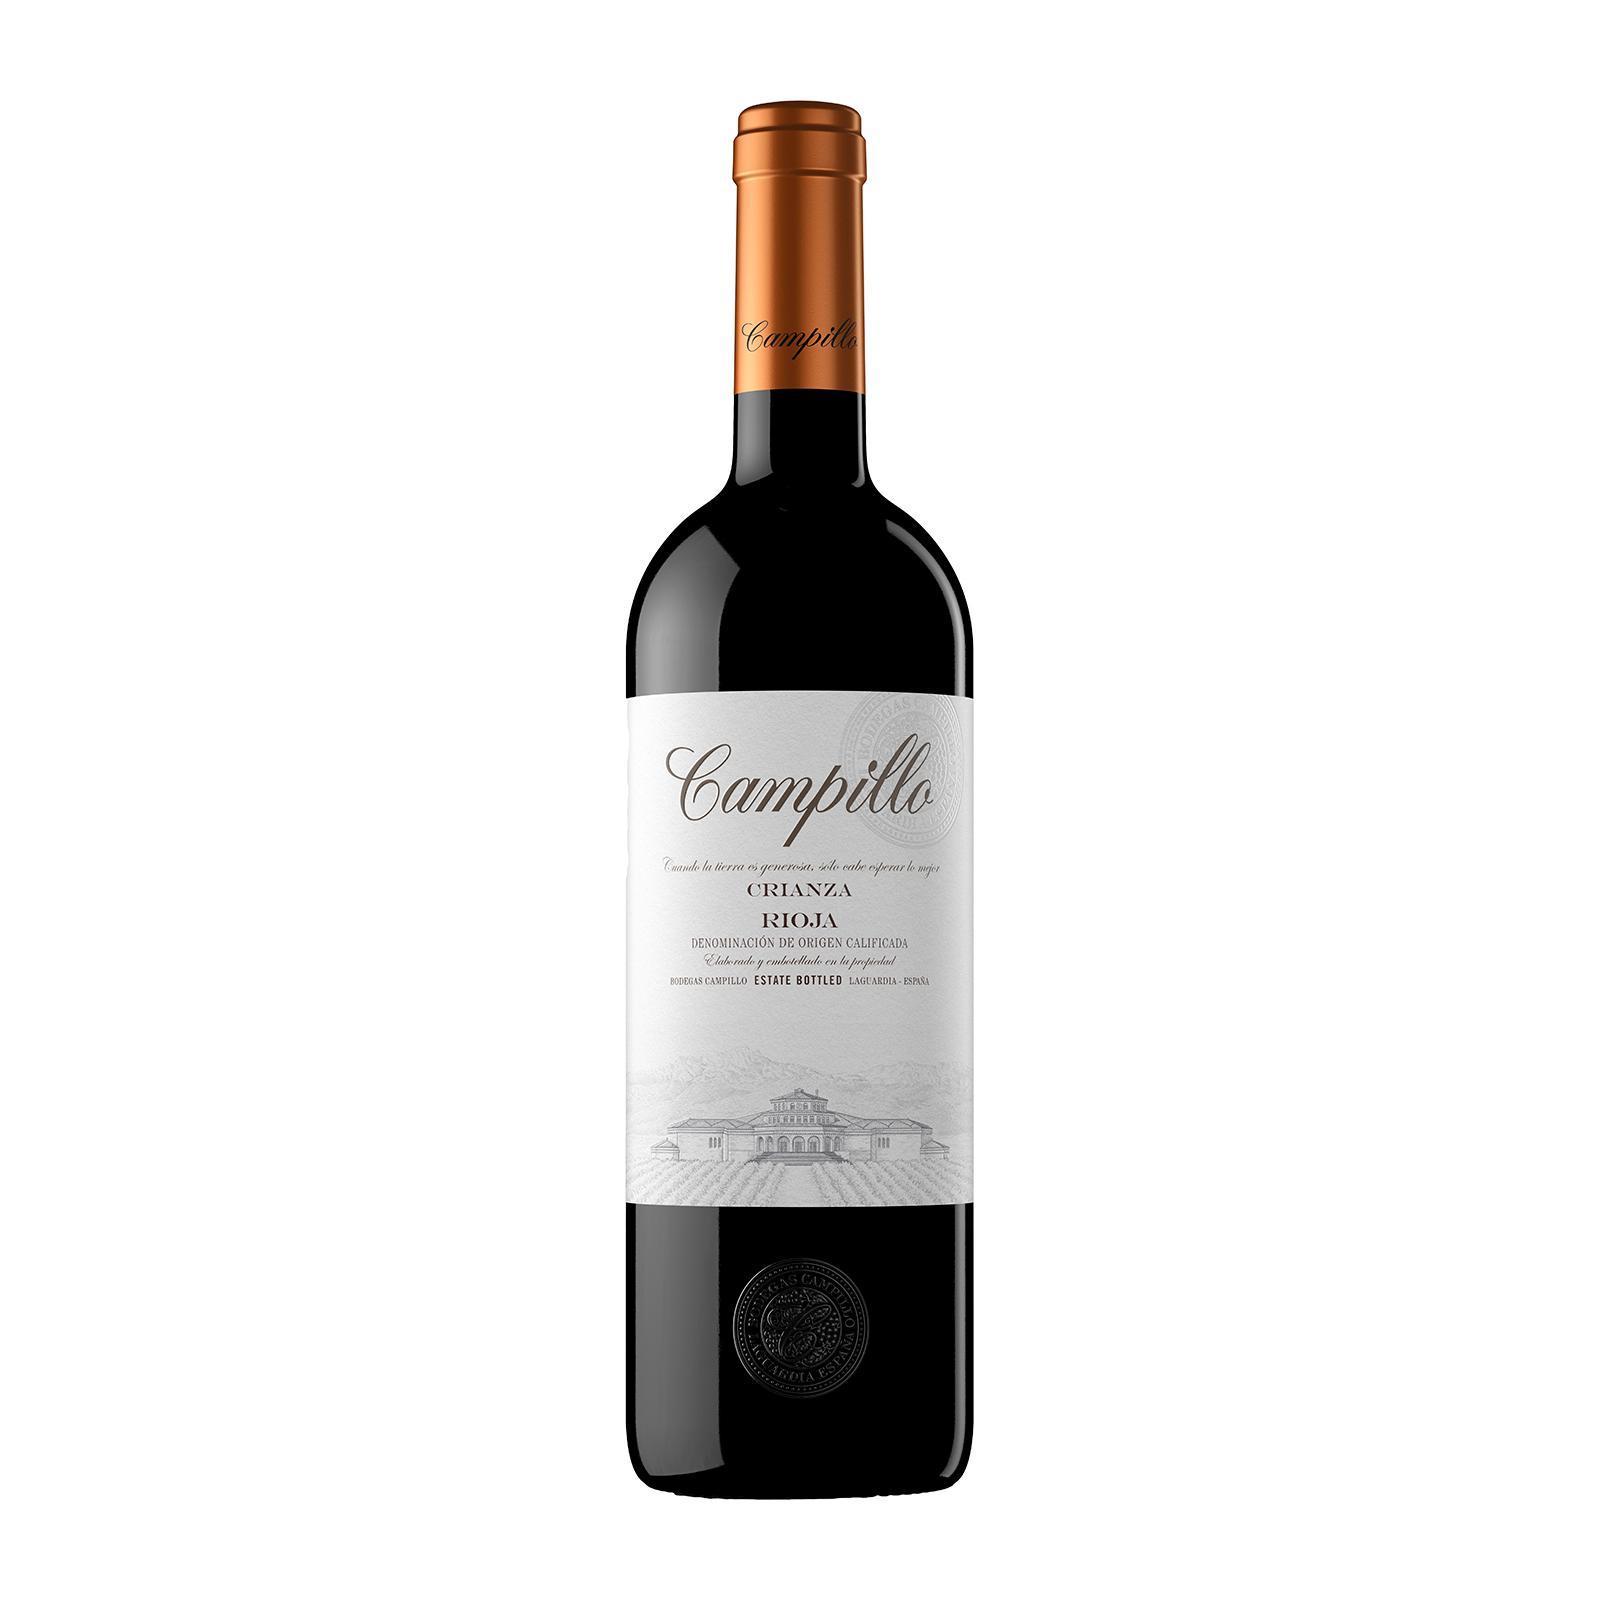 Bodegas Campillo Crianza 2015 Rioja Tempranillo Spanish Wine - By TANINOS